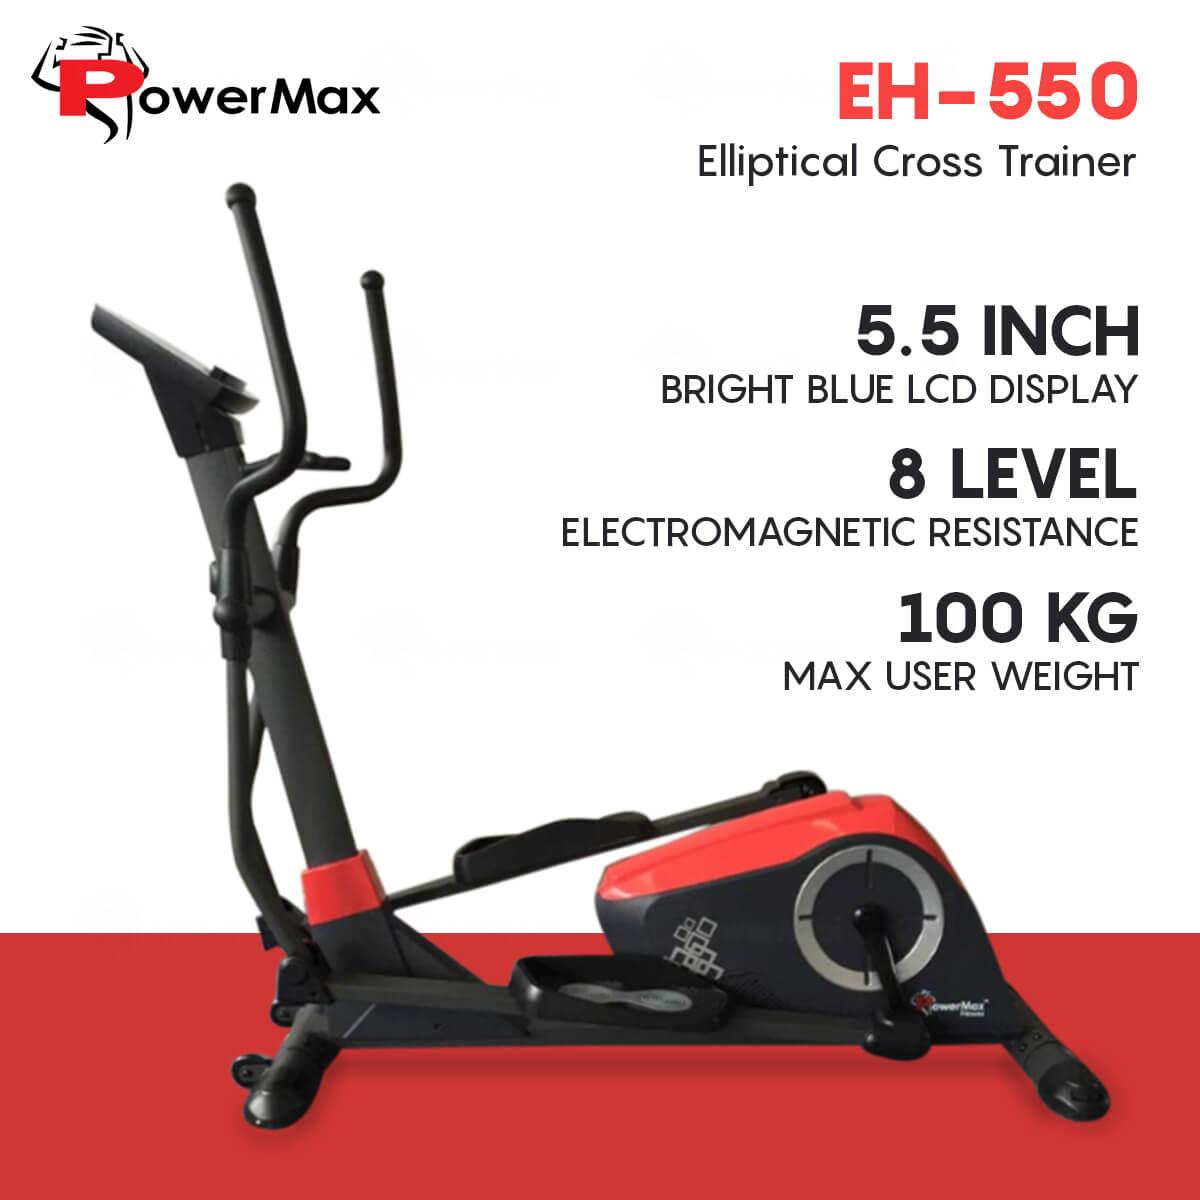 EH-550 Cross Trainer